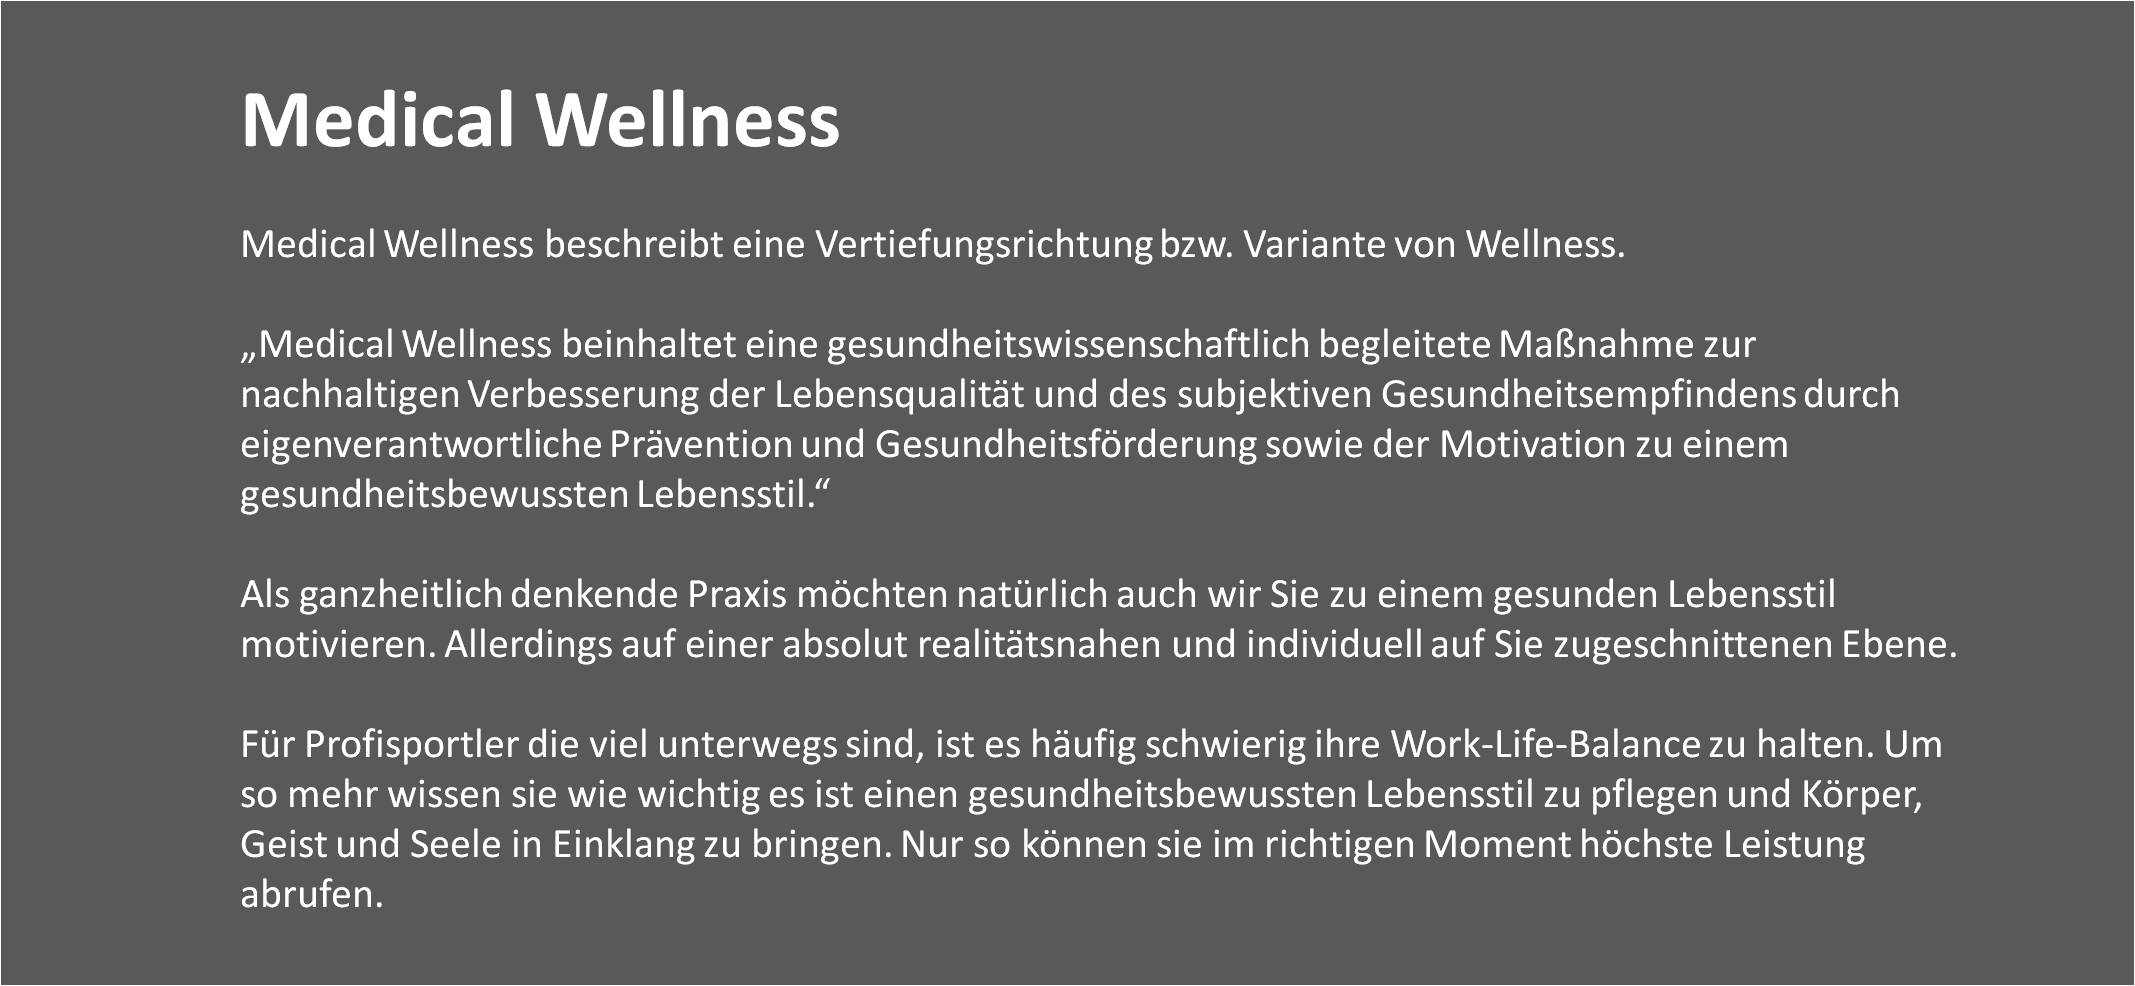 Medical Wellness